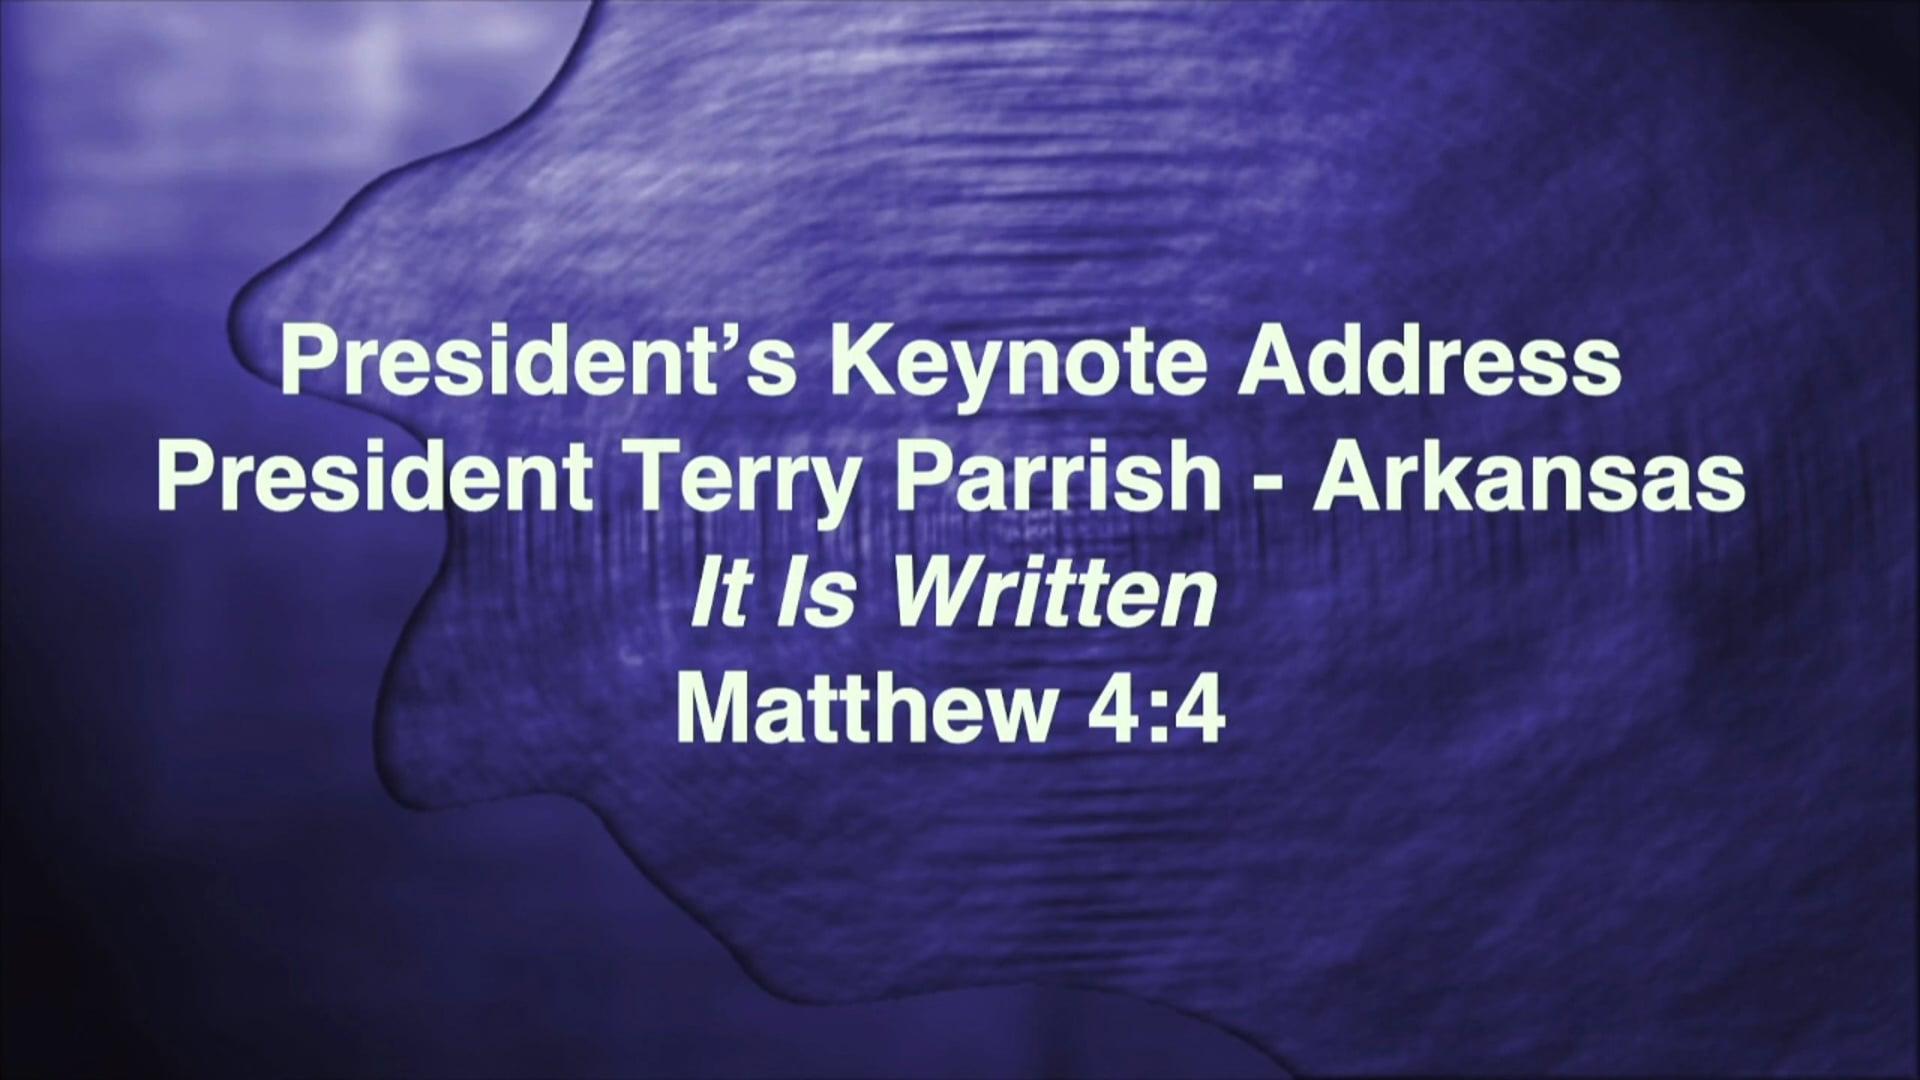 President's Keynote Address - Bro. Terry Parrish, Pastor, Spring Creek BC, Benton, Arkansas